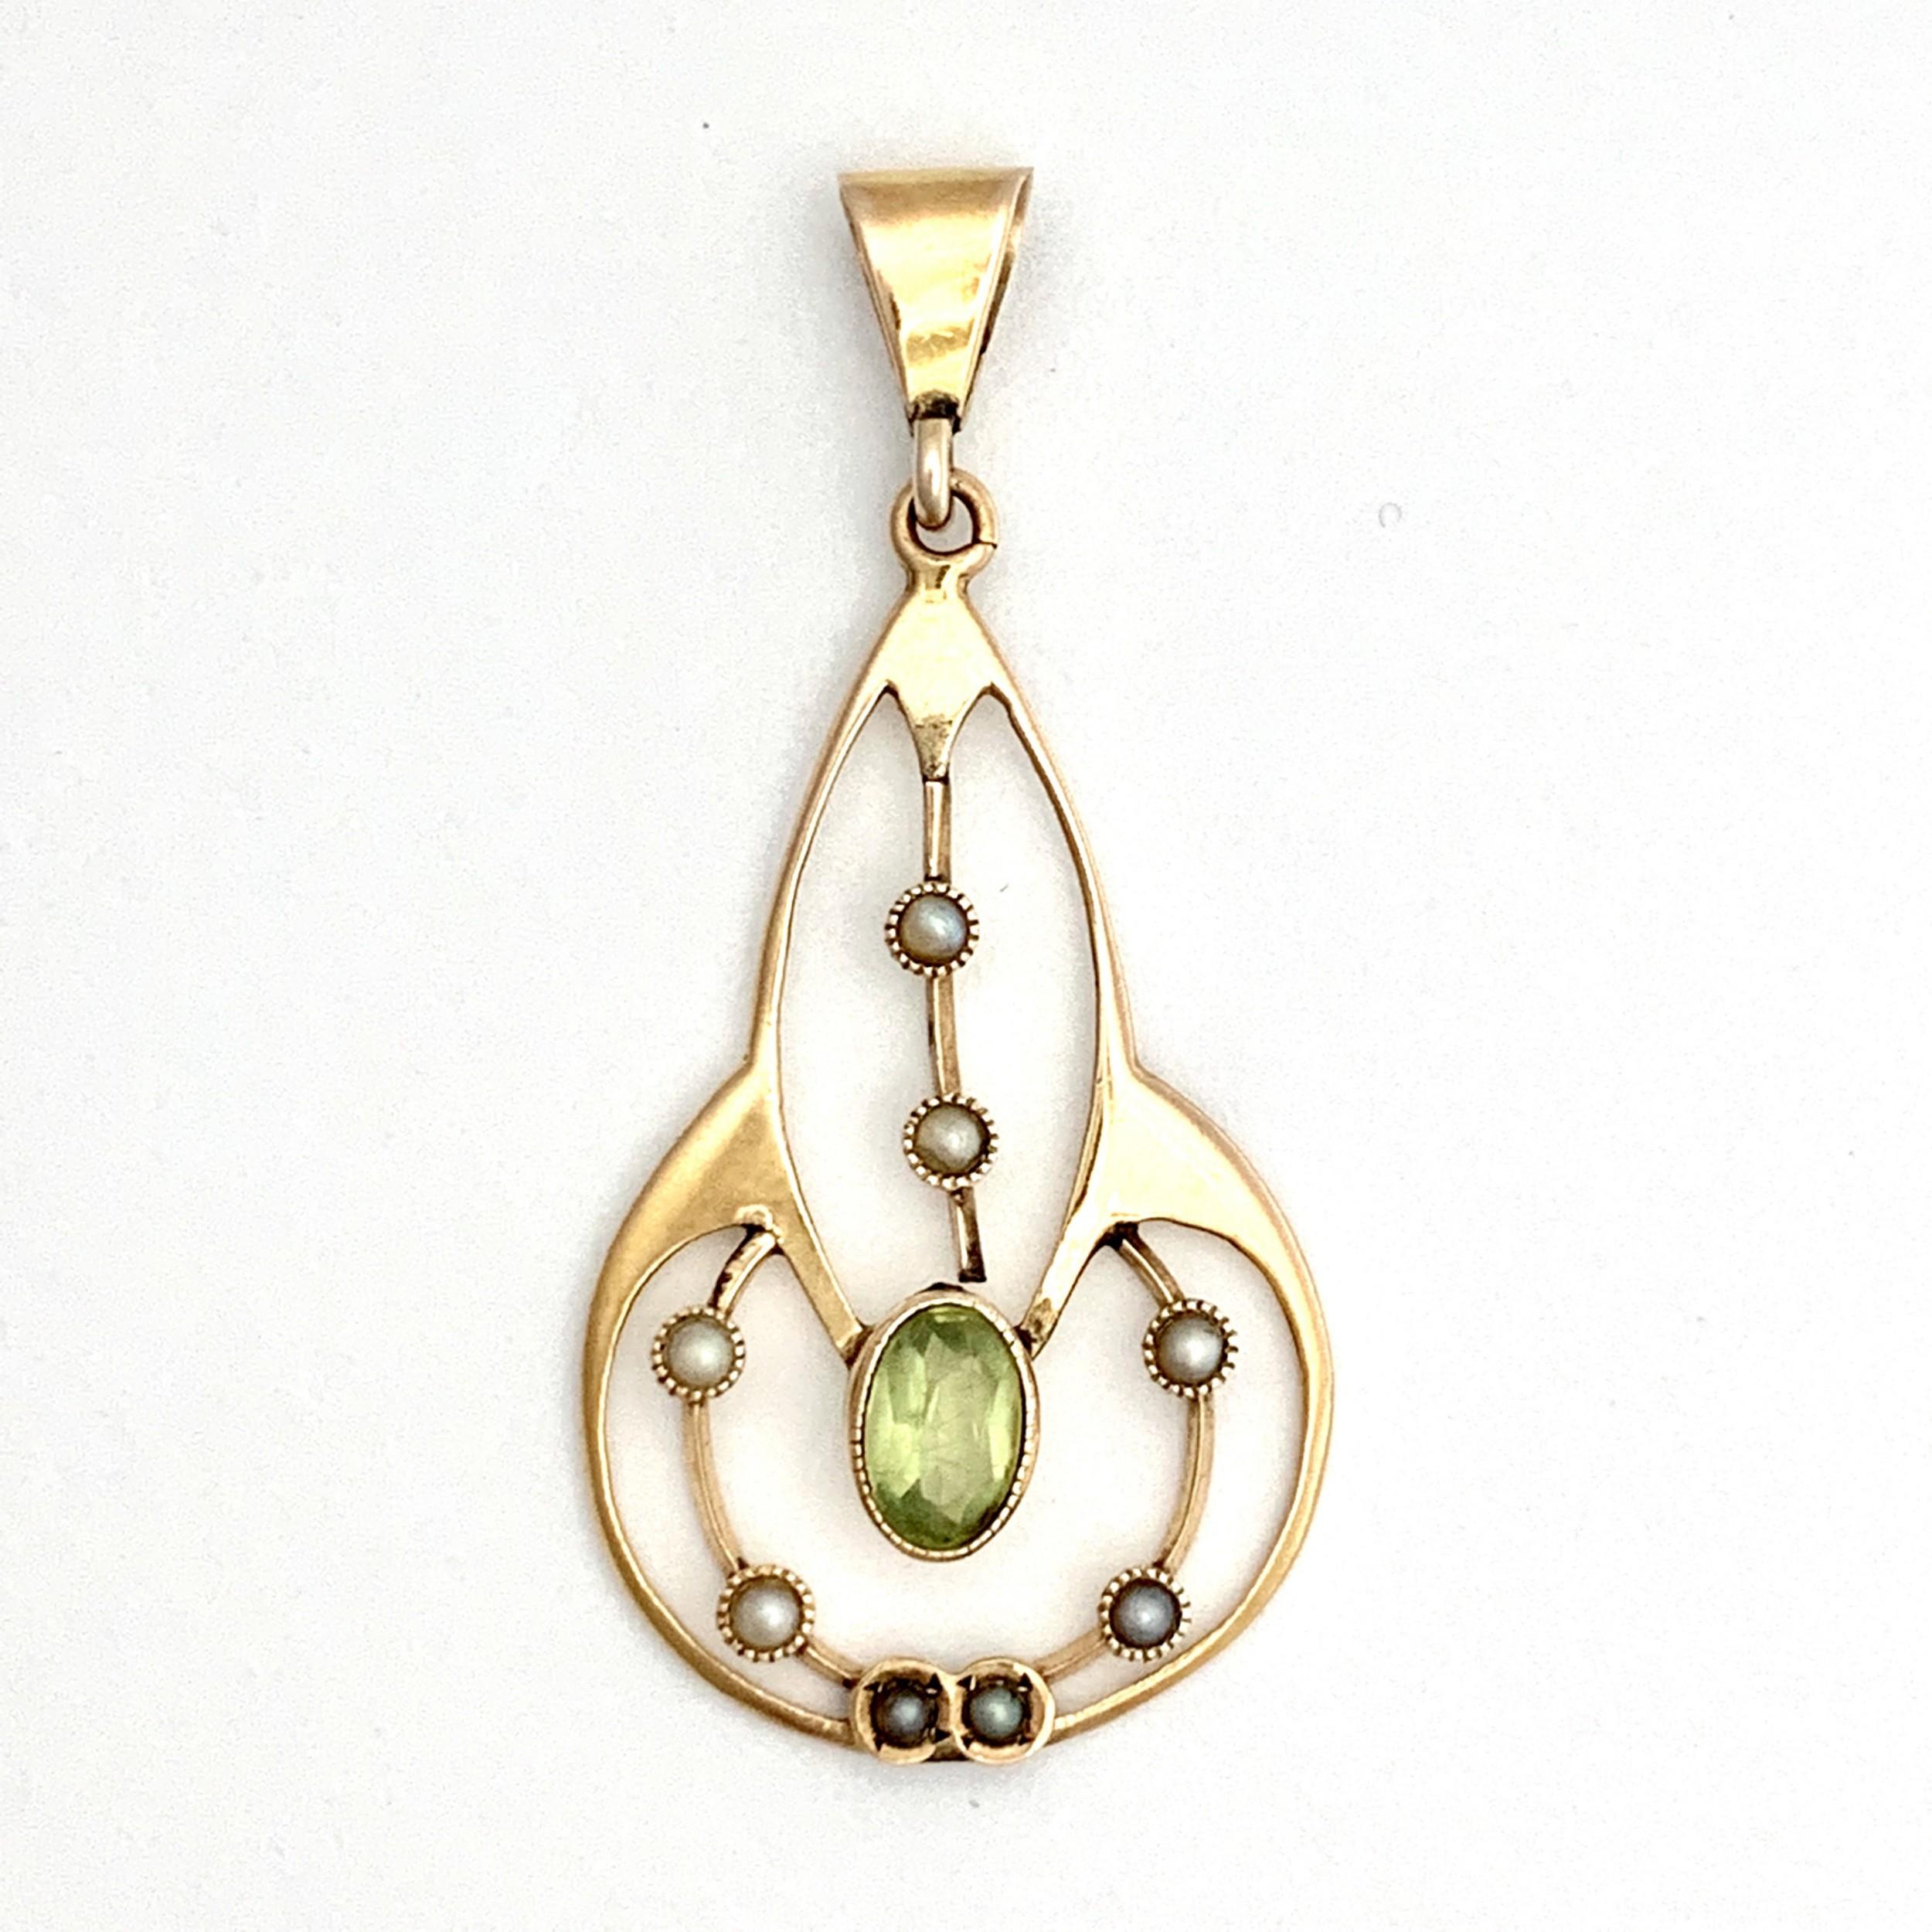 edwardian 9ct gold peridot and seed pearl pendant